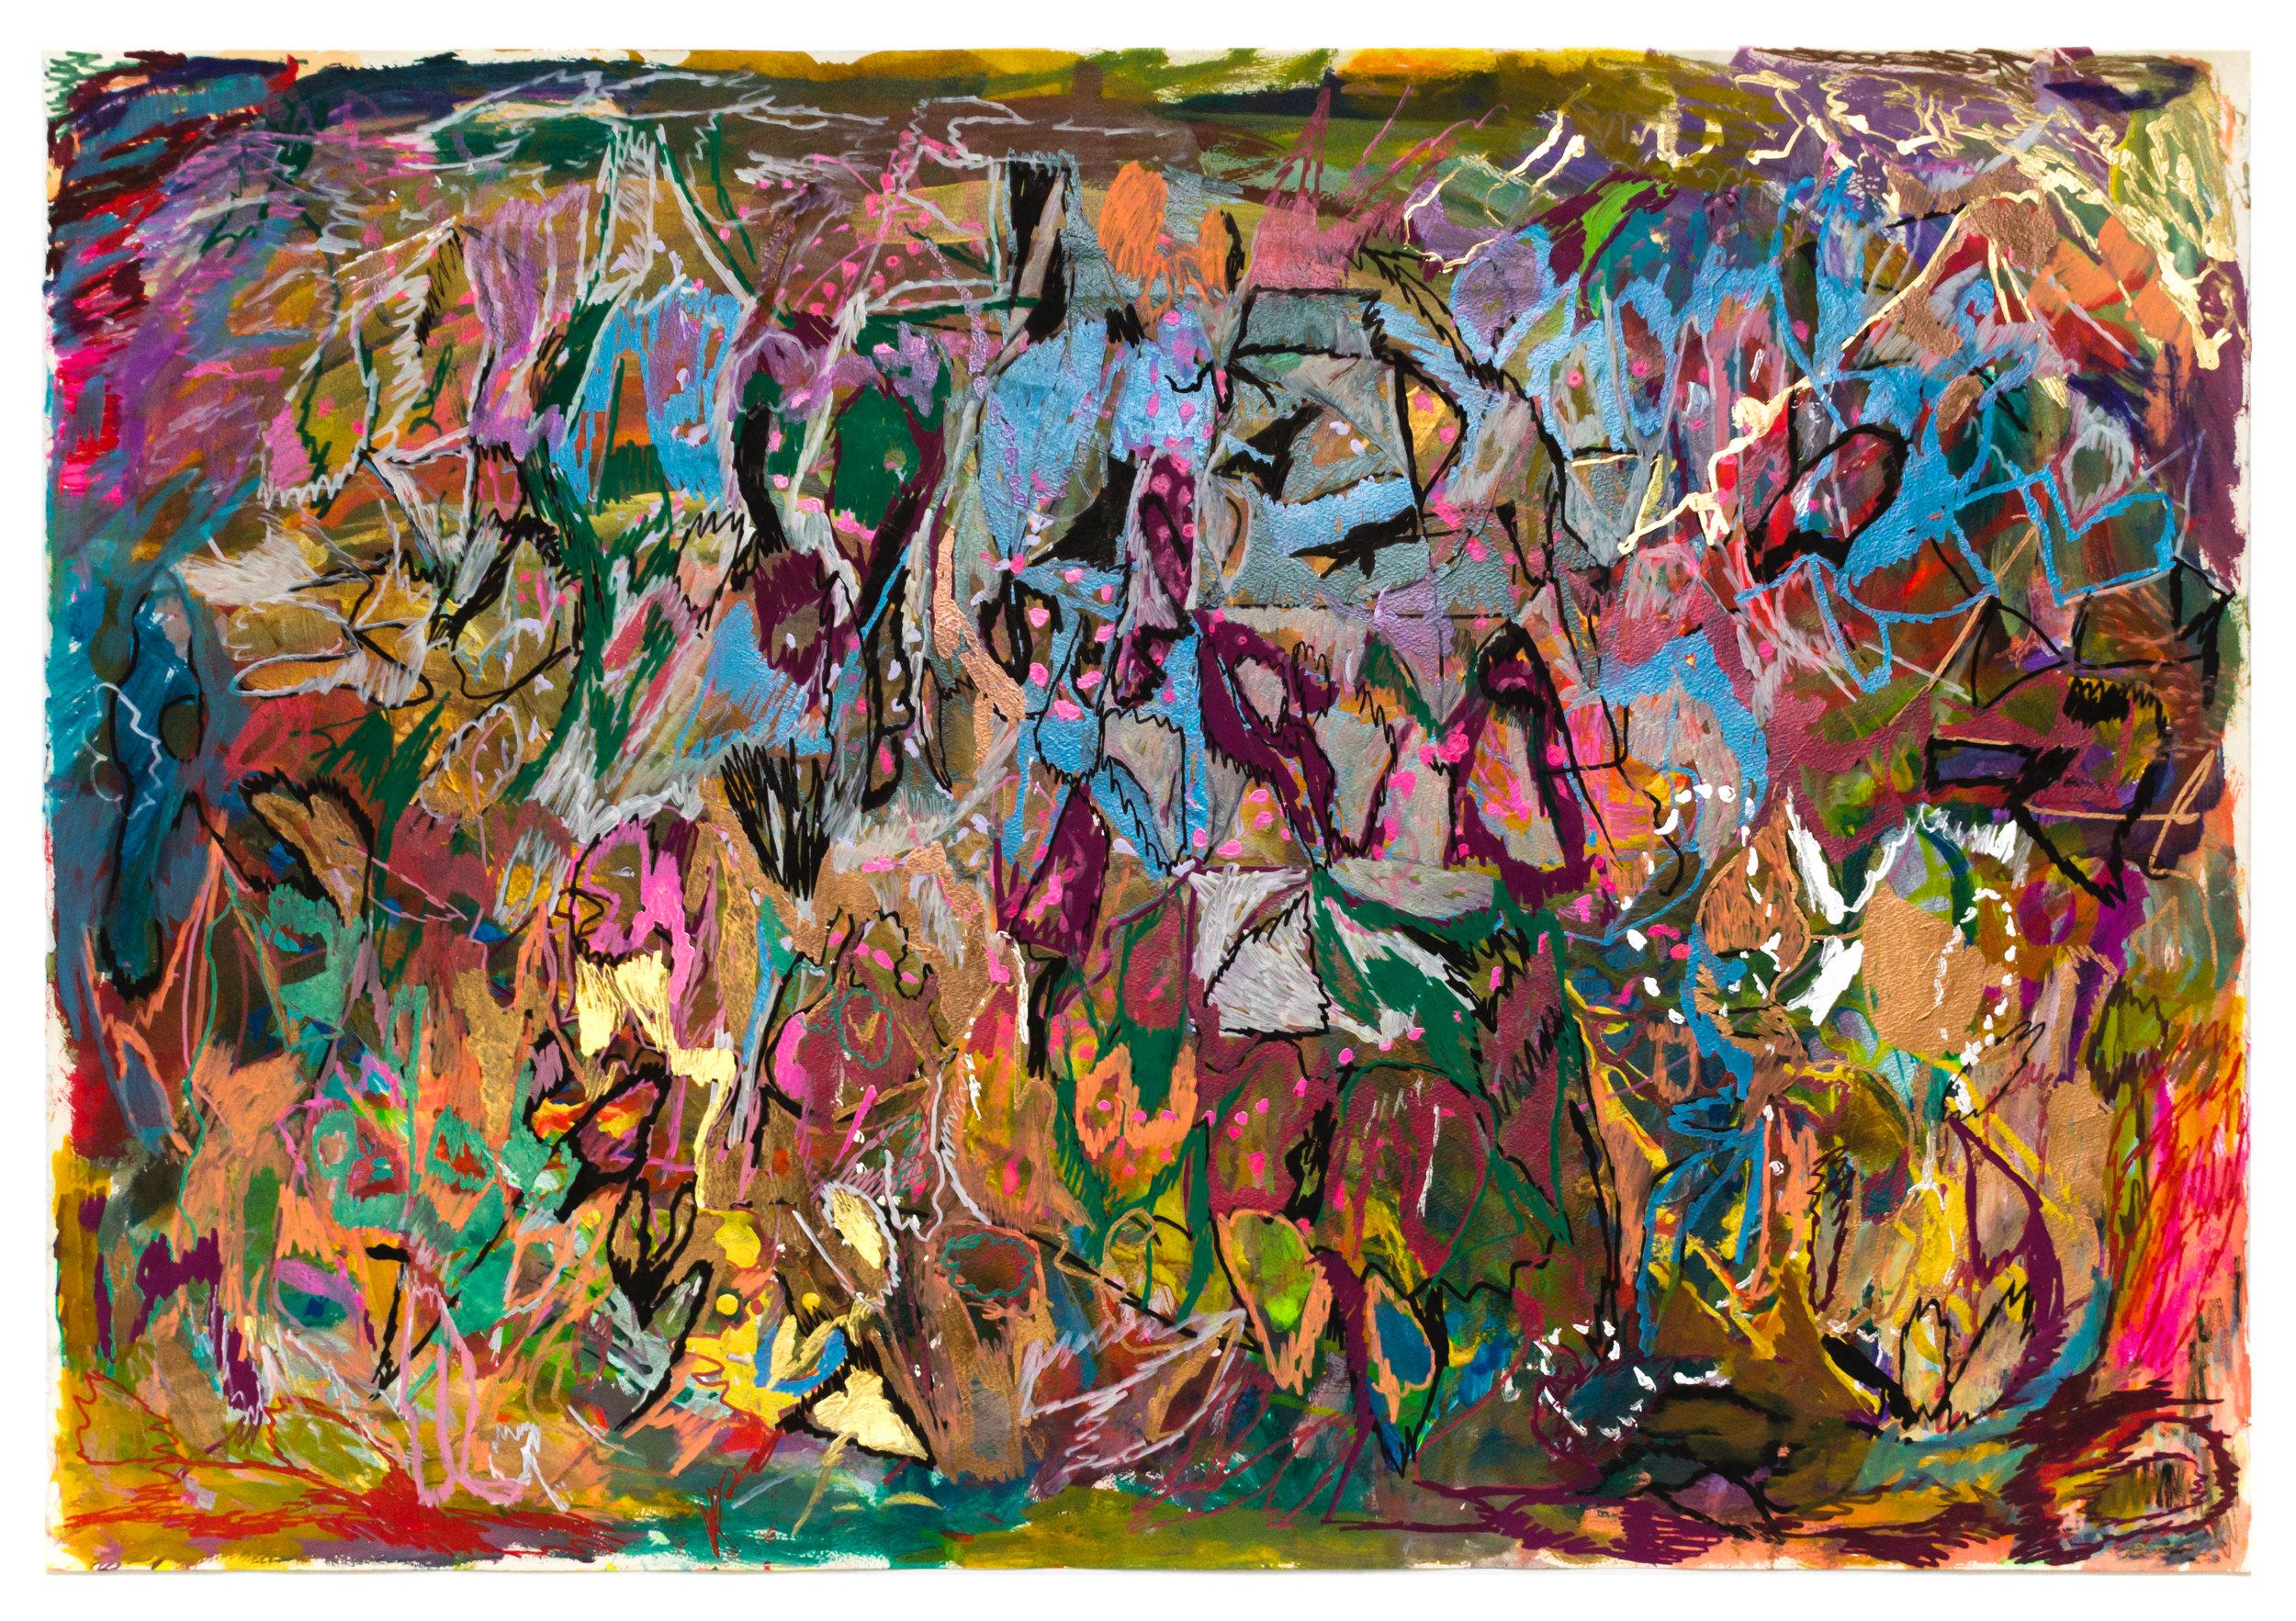 Joseph Alef, Untitled (JA 102), 2018, Work on paper 29.5 x 42.25 inches